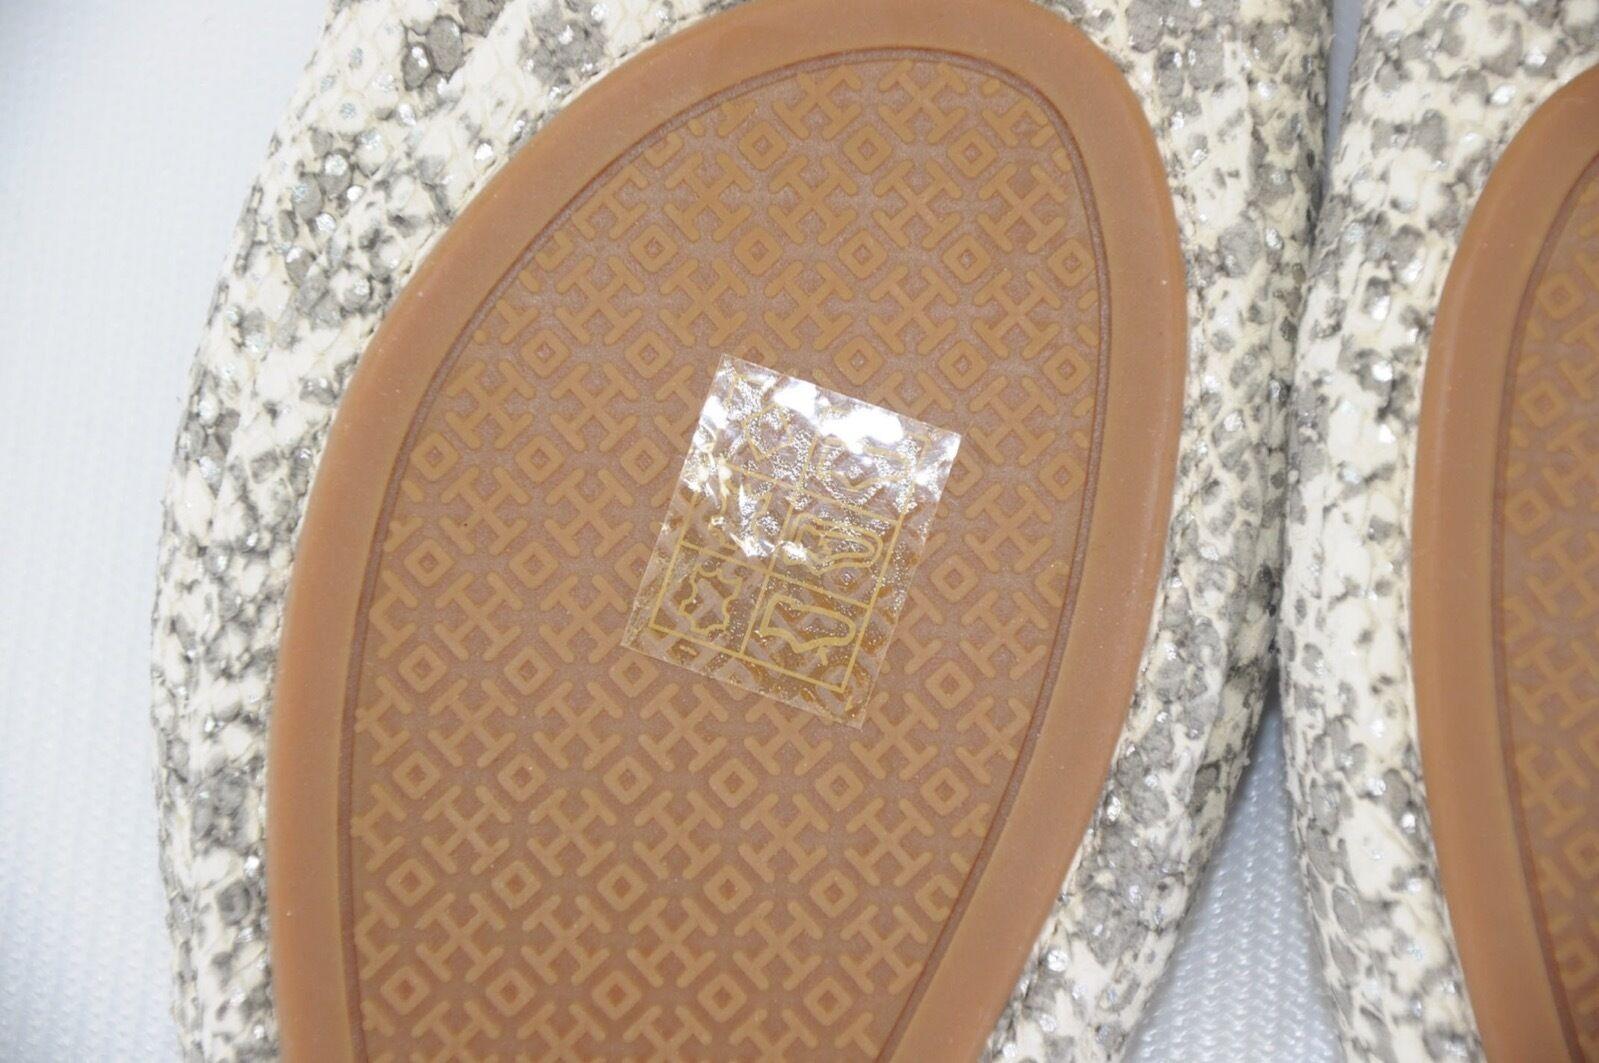 NEWTORY BURCH Travel Leder T Ballet Flats Snake Embossed Sparkling Leder Travel Roccia 7.5 2197a4